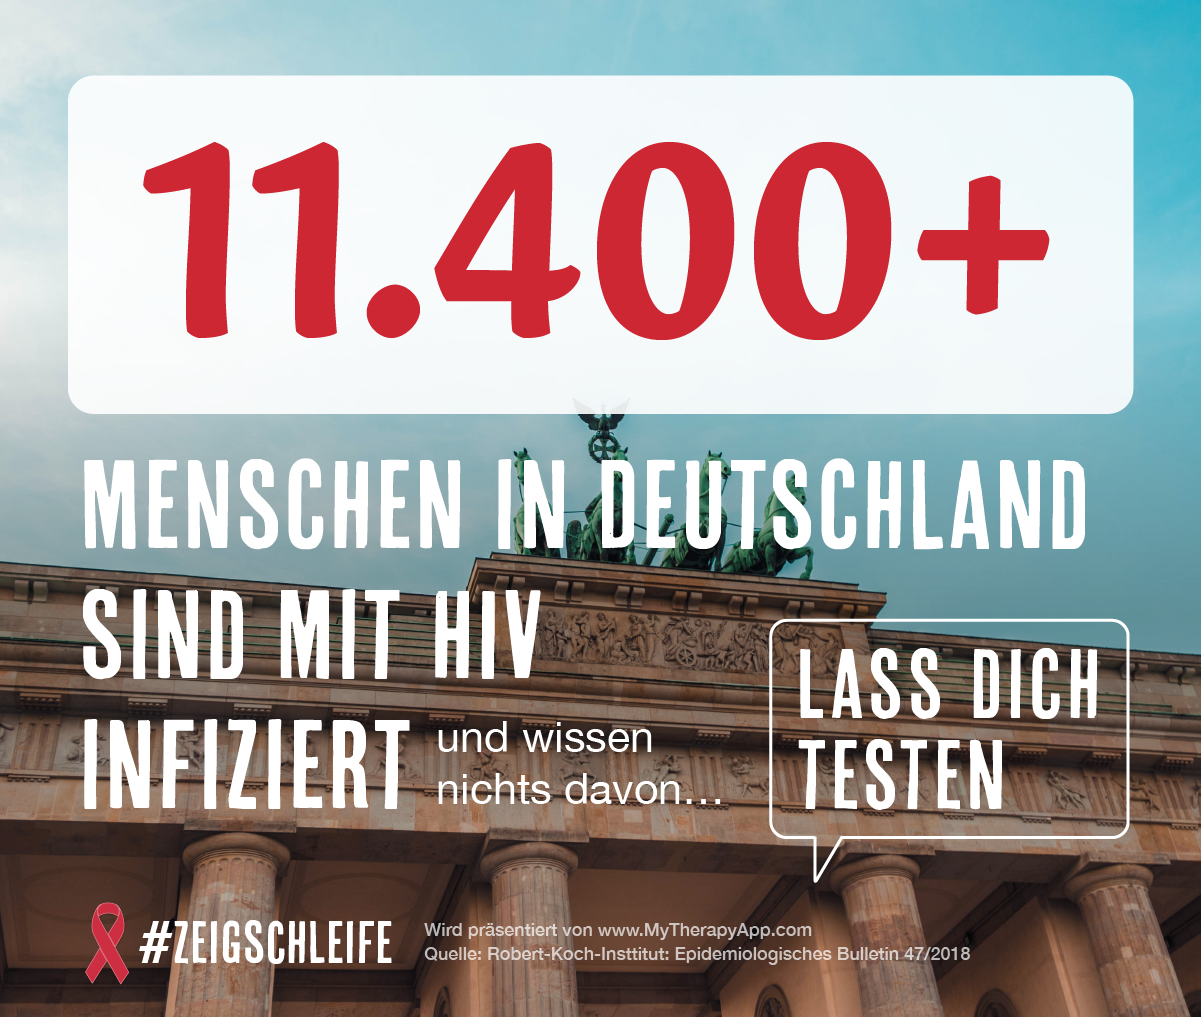 Grafik zum Welt-Aids-Tag